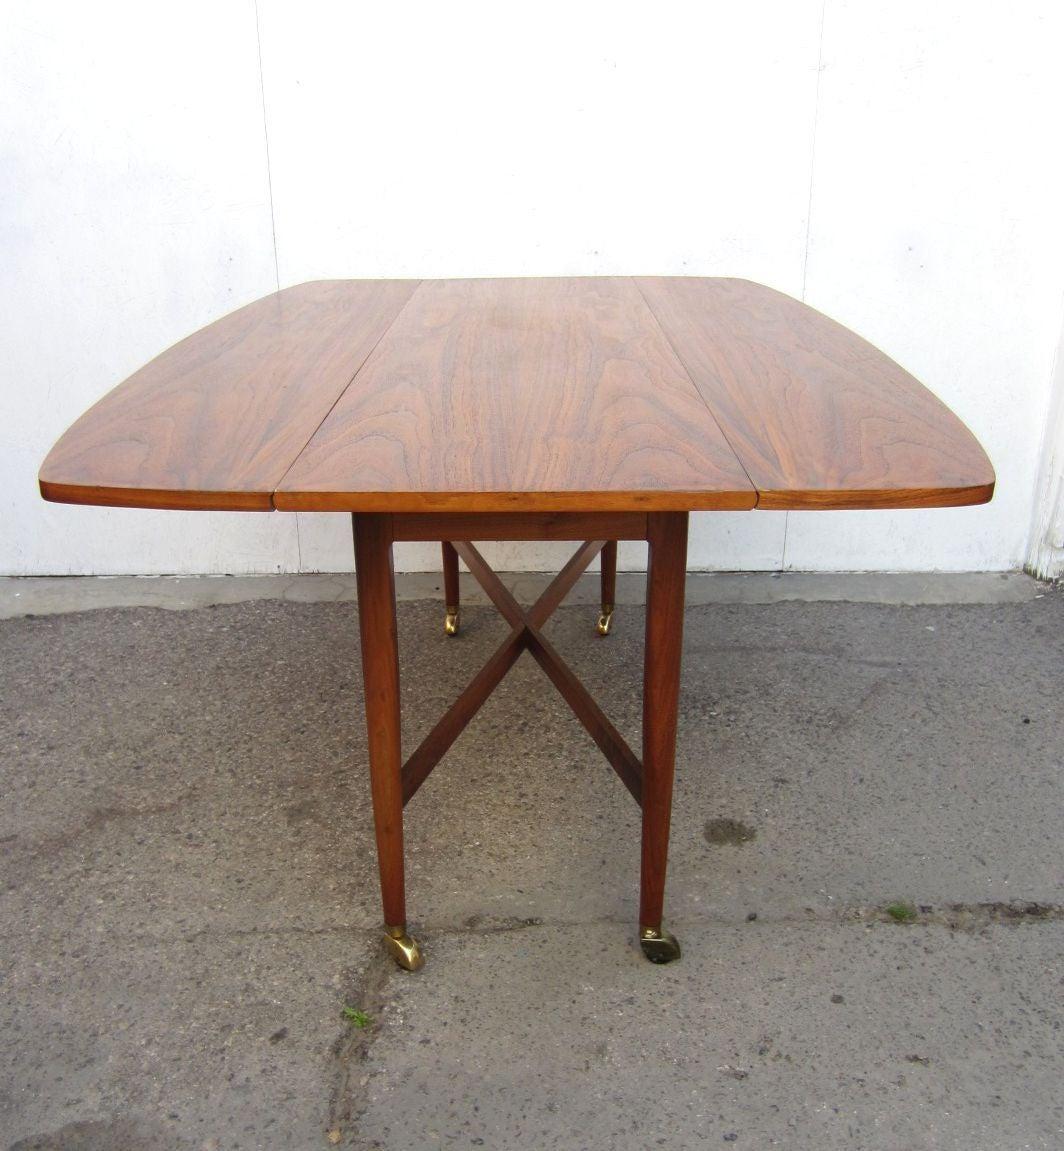 drexel dining room furniture 1960 | 1960 Drexel Declaration Kipp Stewart McDougell Drop-Leaf ...